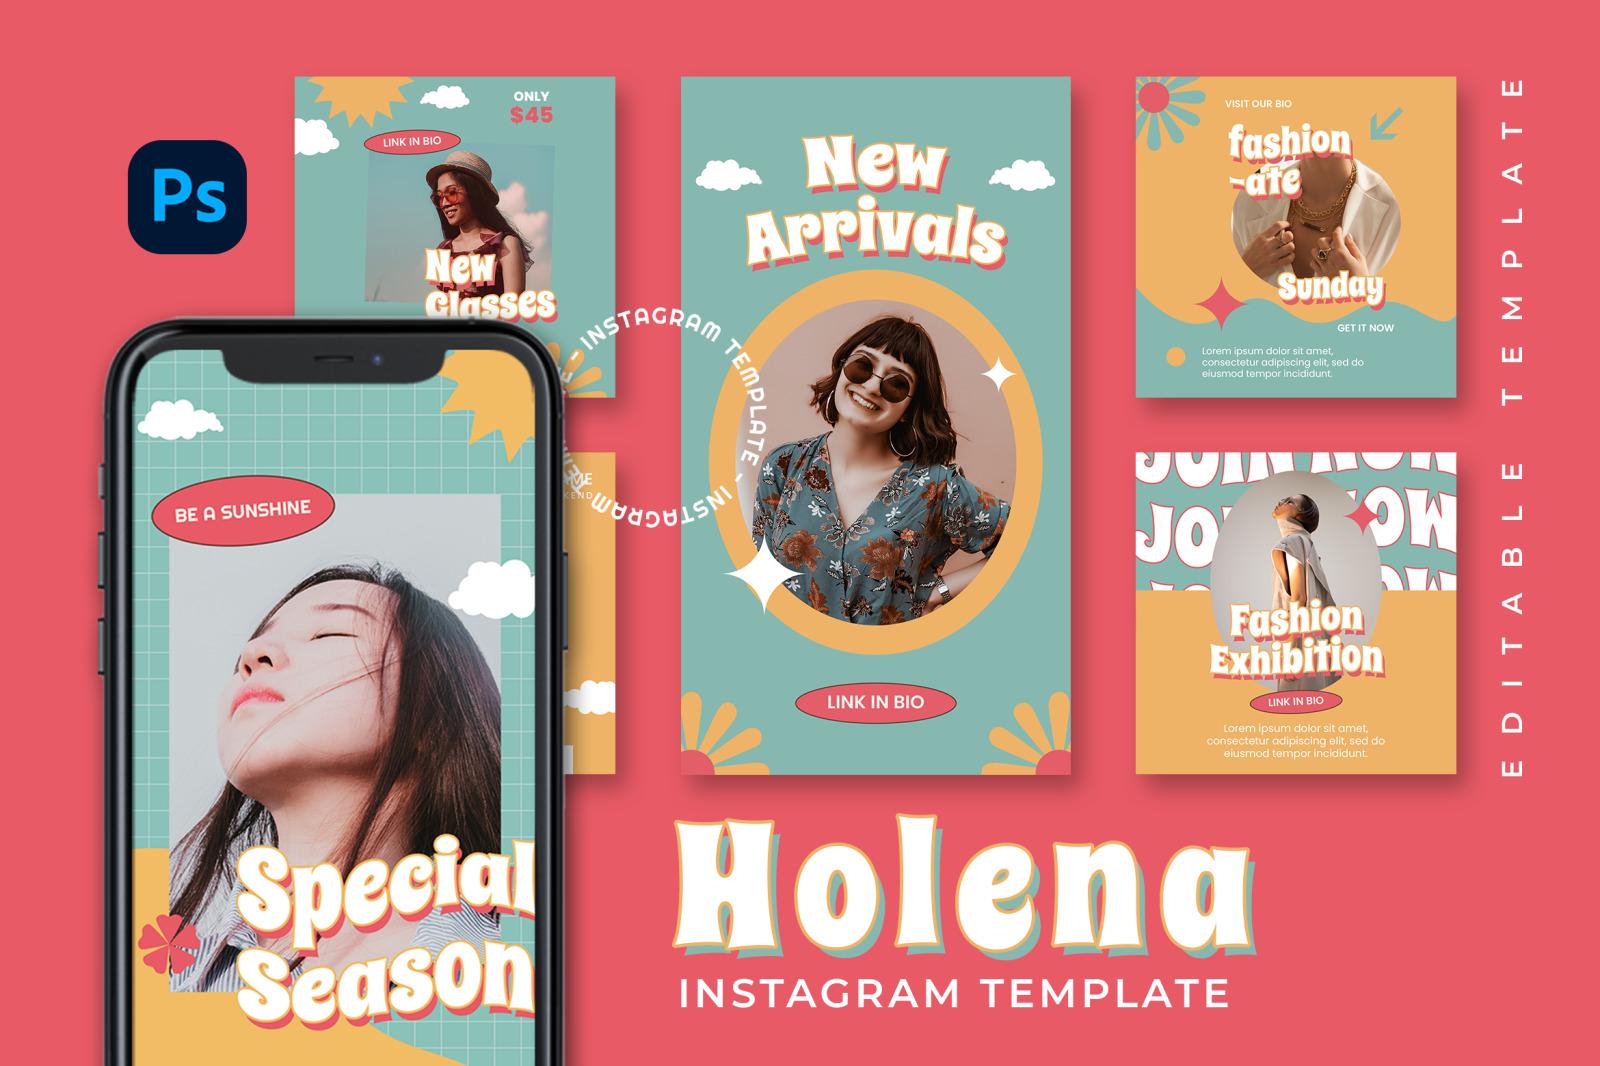 Holena Instagram Template